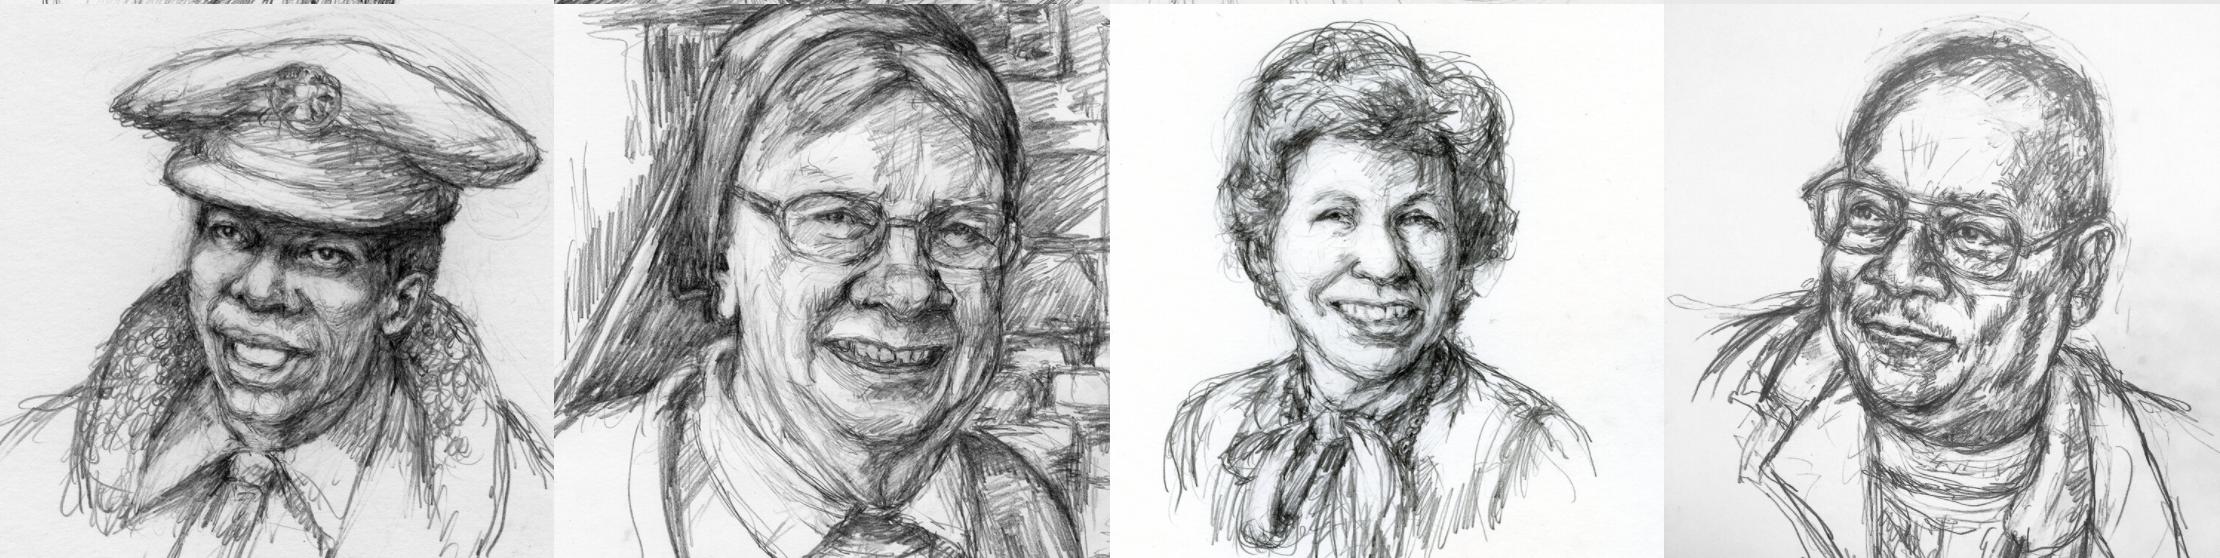 Drawings by RA Friedman